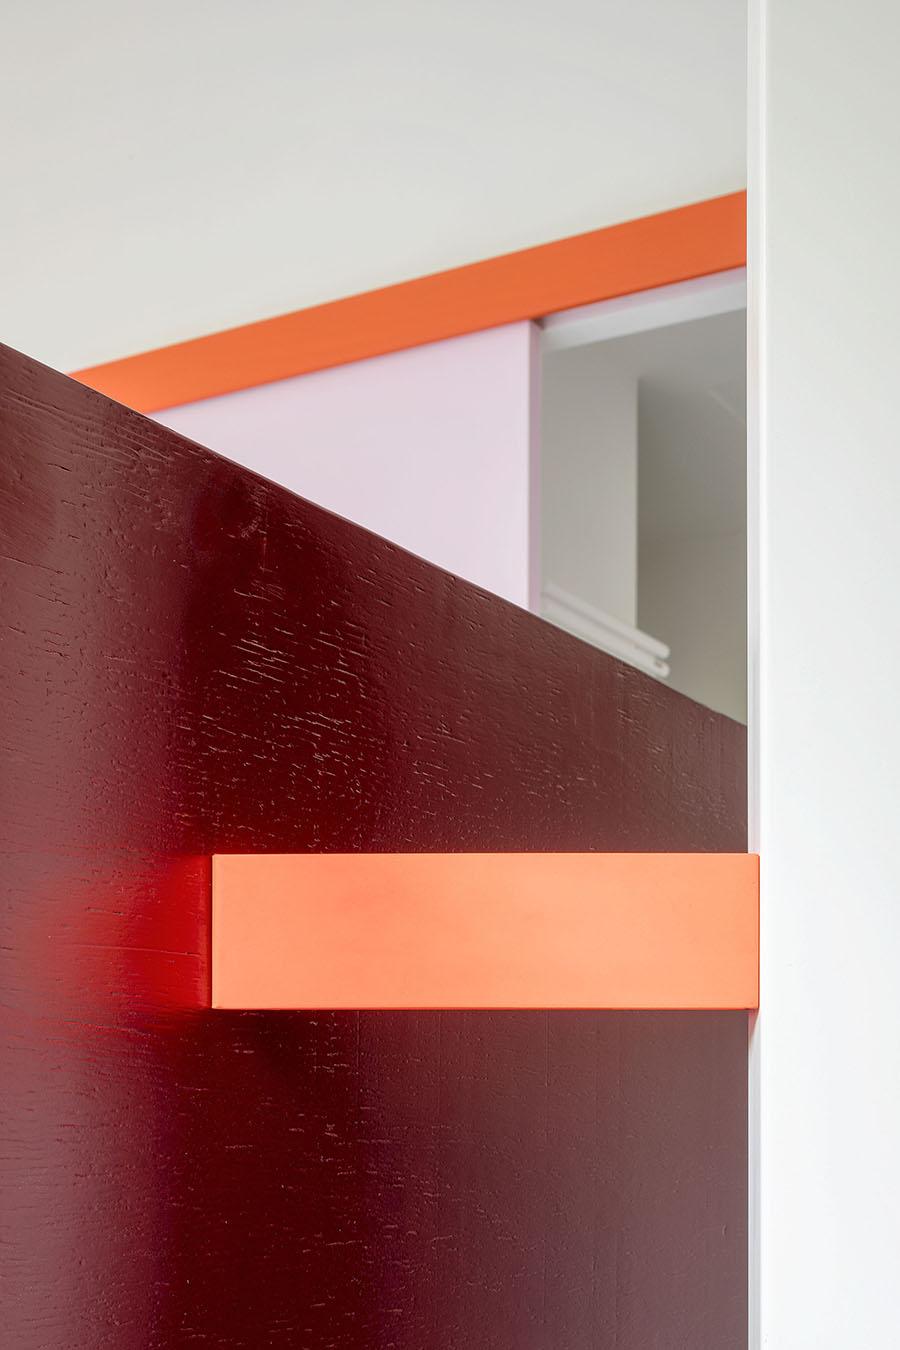 Парад дизайна во Франции: 5 комнат от декораторов (галерея 10, фото 3)